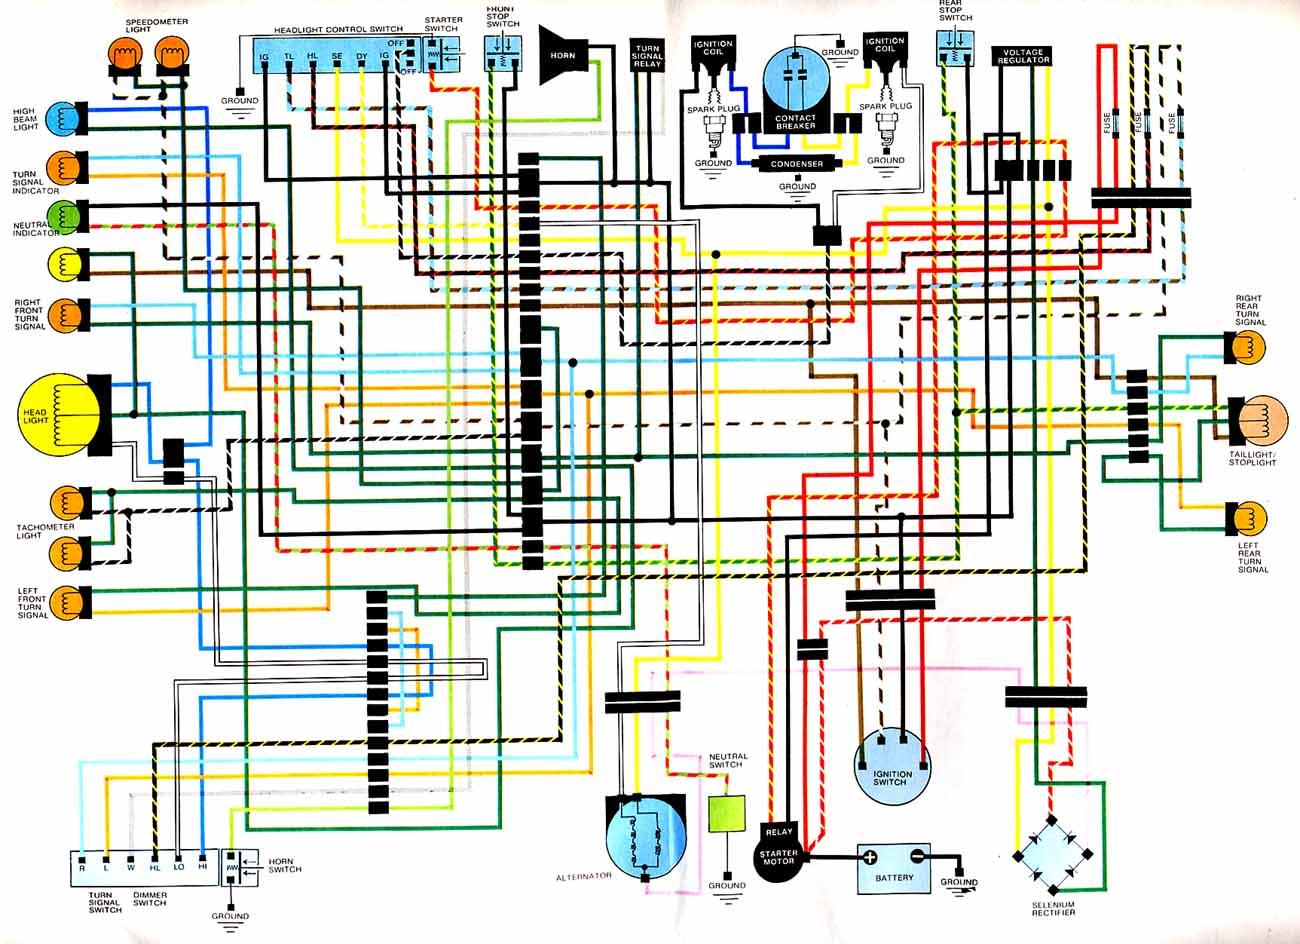 1971 honda sl100 wiring diagram trusted wiring diagram rh dafpods co  1971 honda sl100 wiring diagram